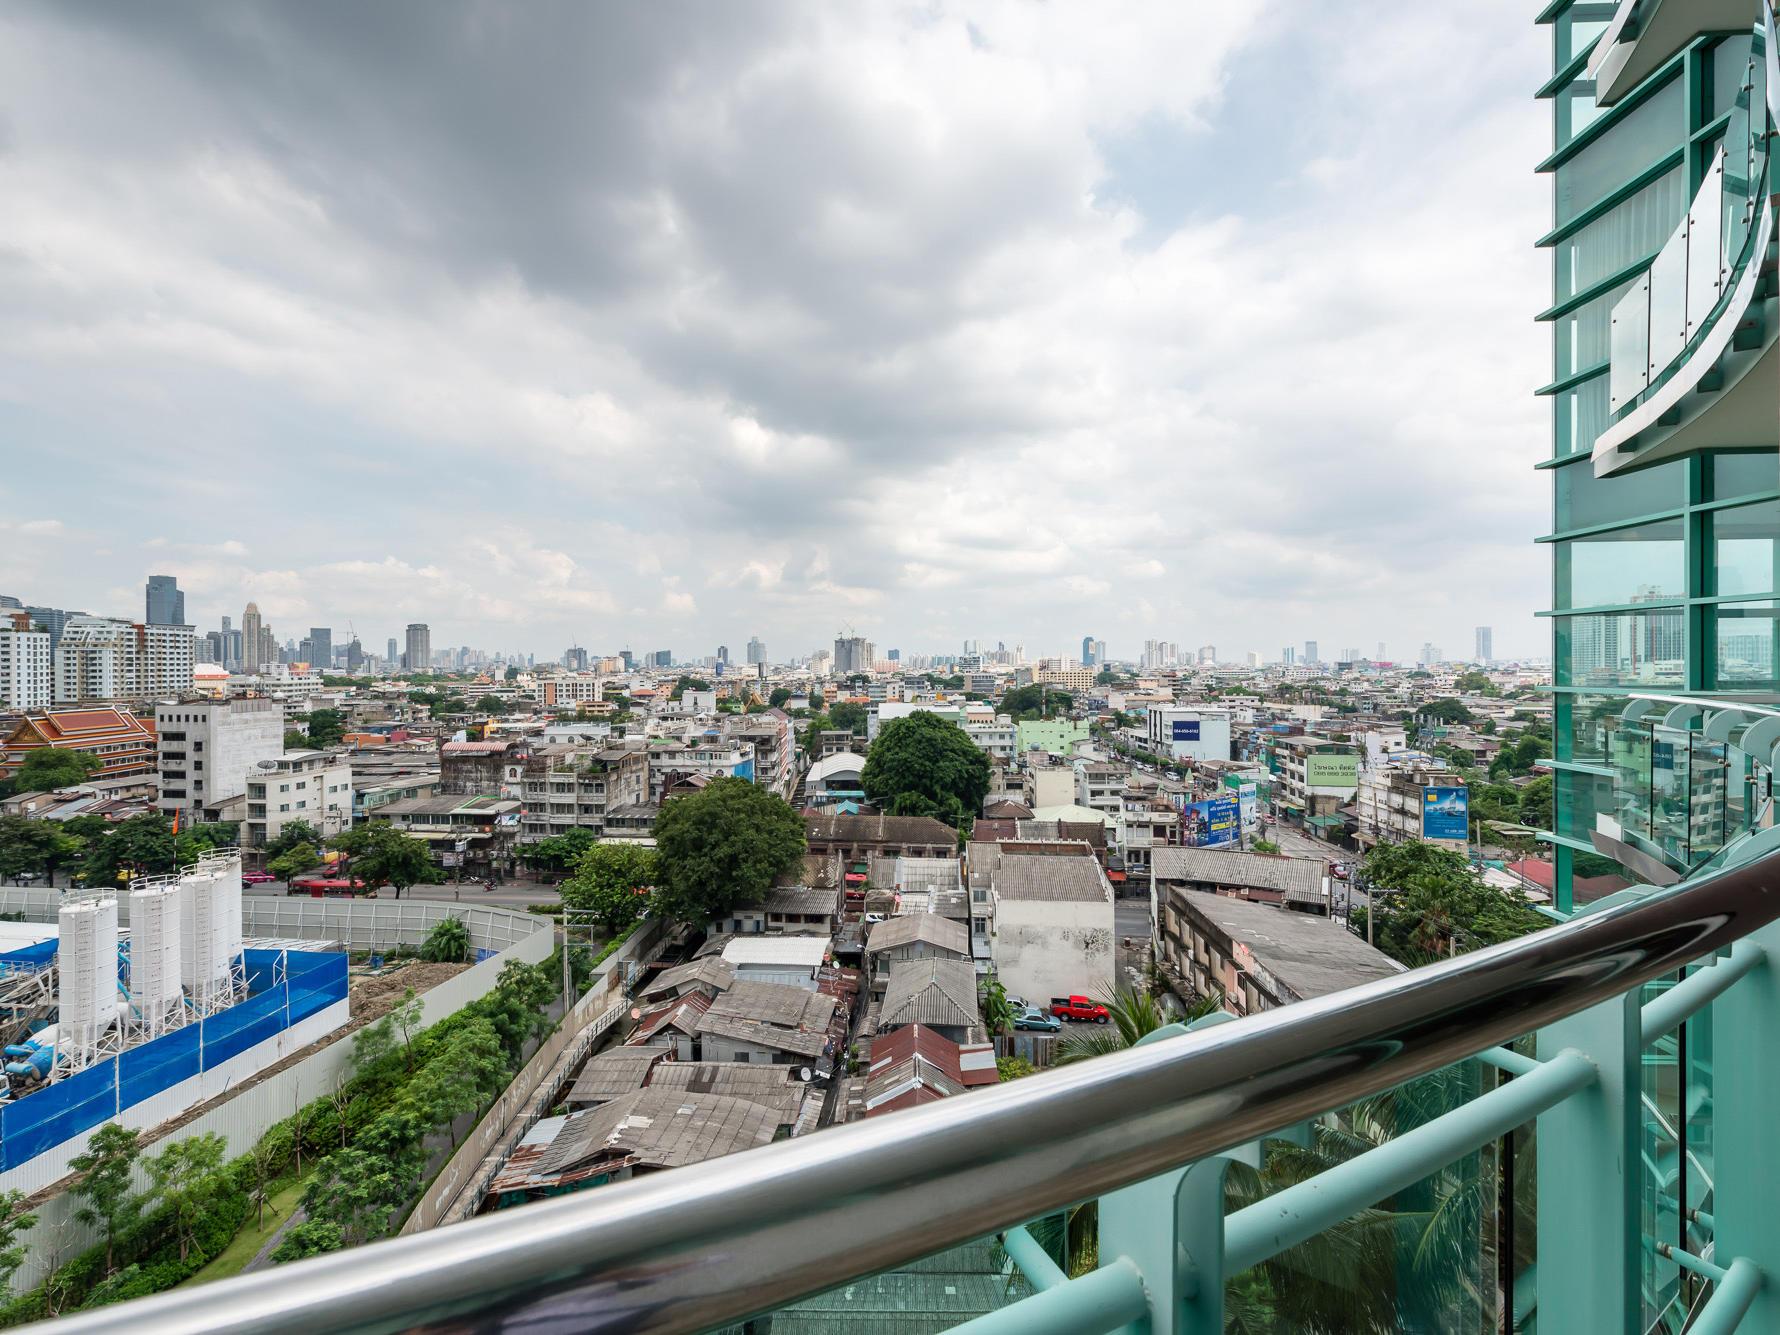 City view from a balcony at Chatrium Hotel Riverside Bangkok